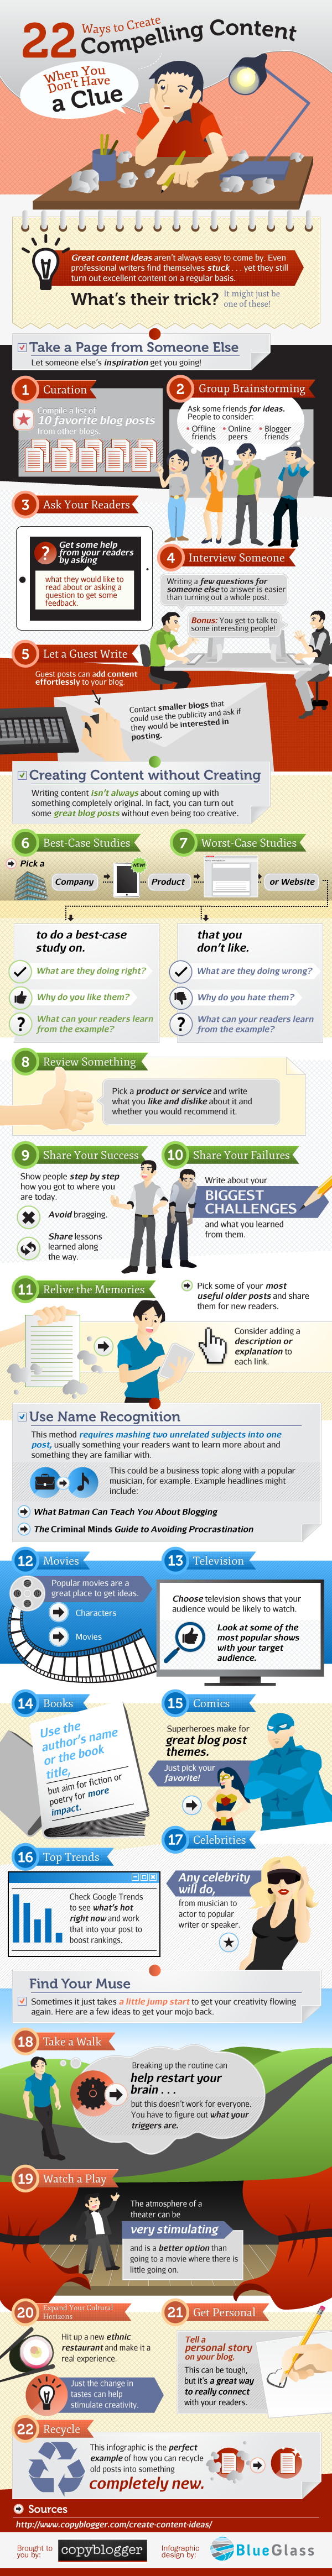 copyblogger-write-compelling-content-infographic-kissmetrics.png